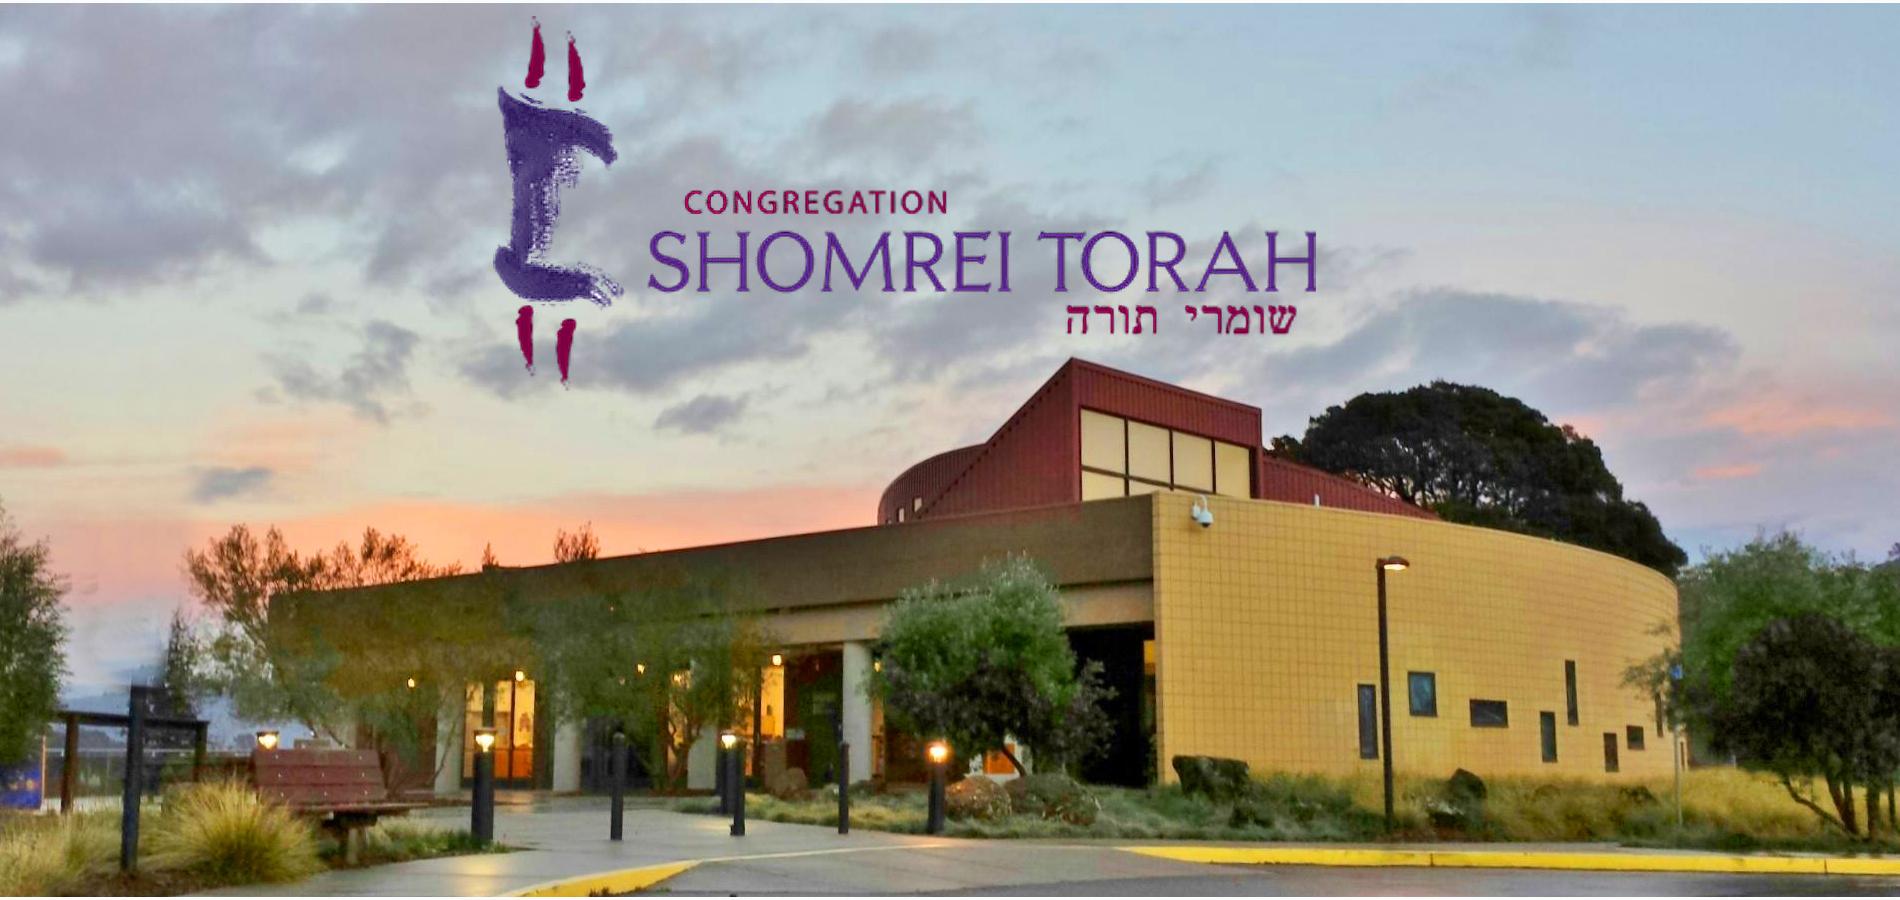 "<a href=""/shabbat_torah_study""                                     target=""_blank"">                                                                 <span class=""slider_title"">                                     Join Us                                </span>                                                                 </a>                                                                                                                                                                                       <span class=""slider_description"">Shabbat & Torah Study</span>"